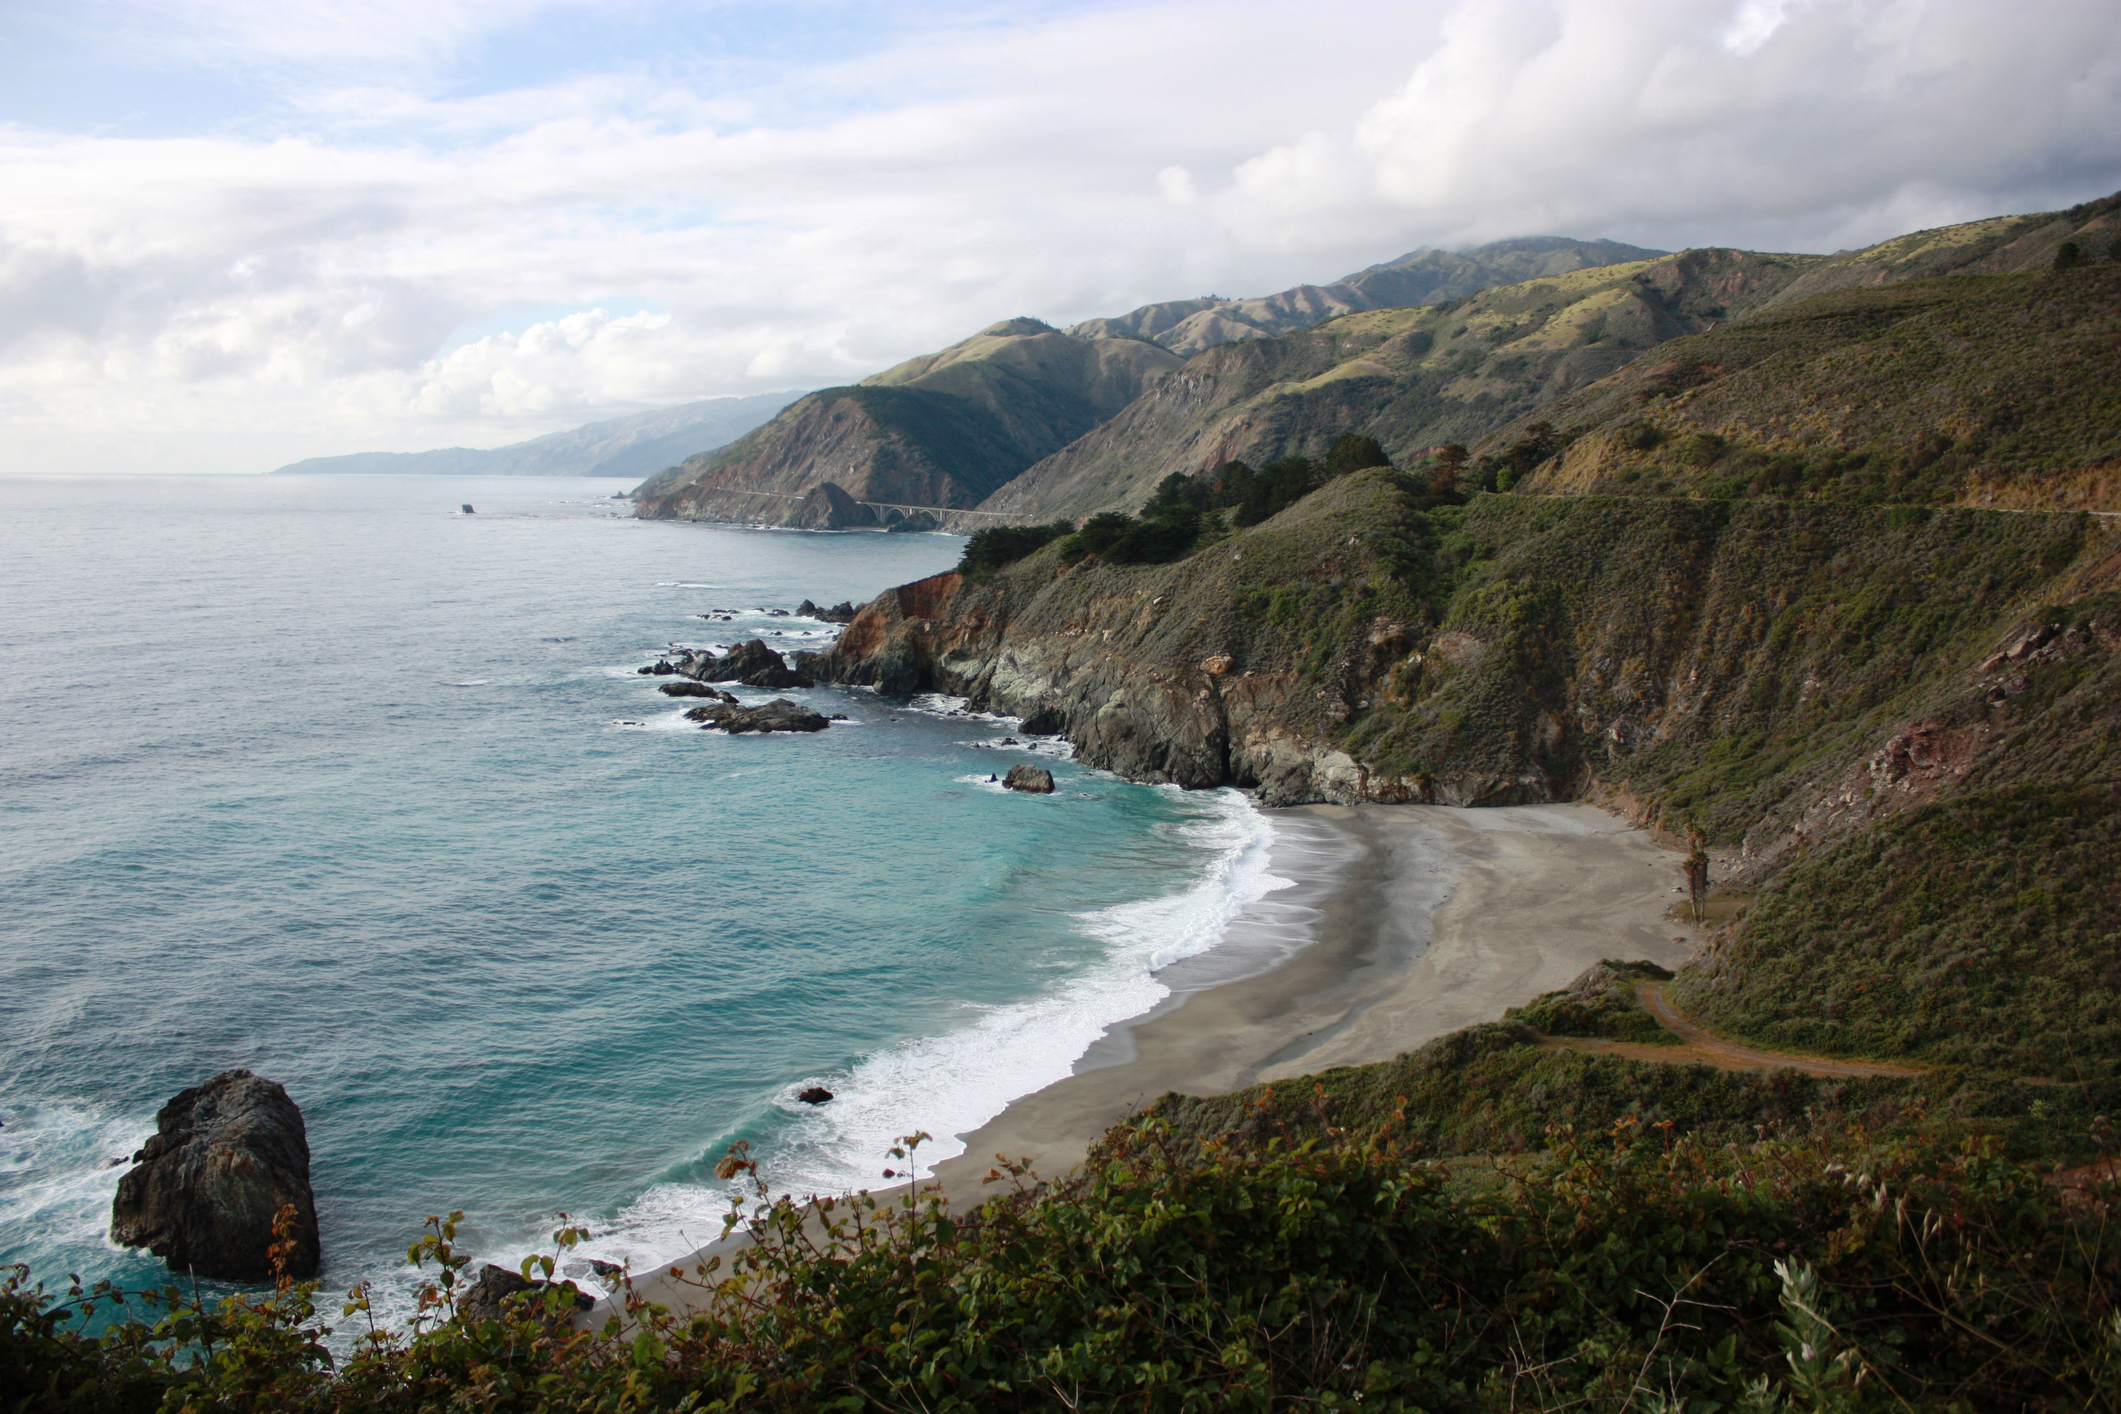 Beautiful coastline of Big Sur California. USA - Marriott Vacation Club